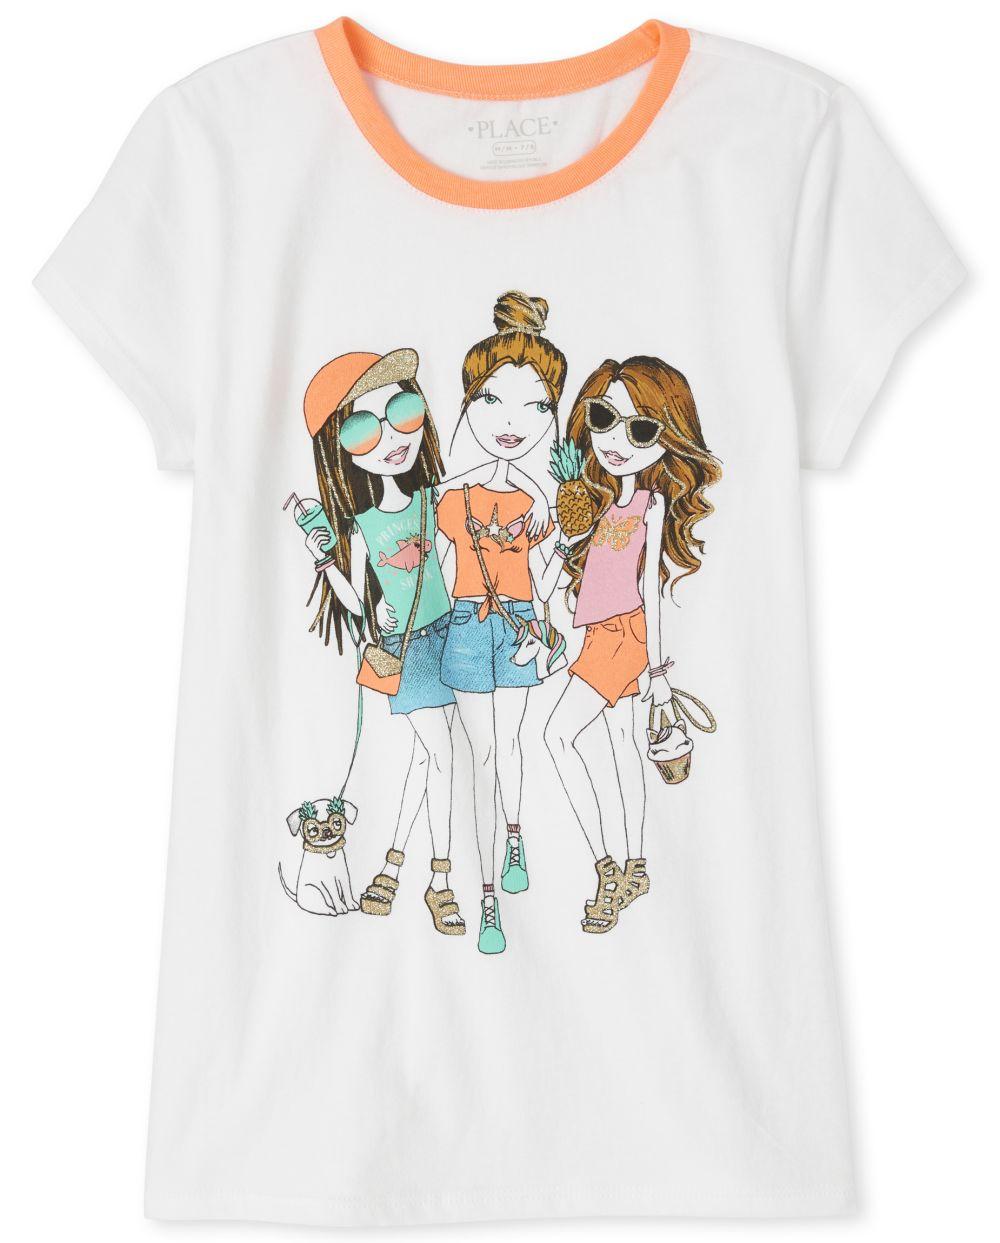 Girls Glitter Squad Graphic Tee